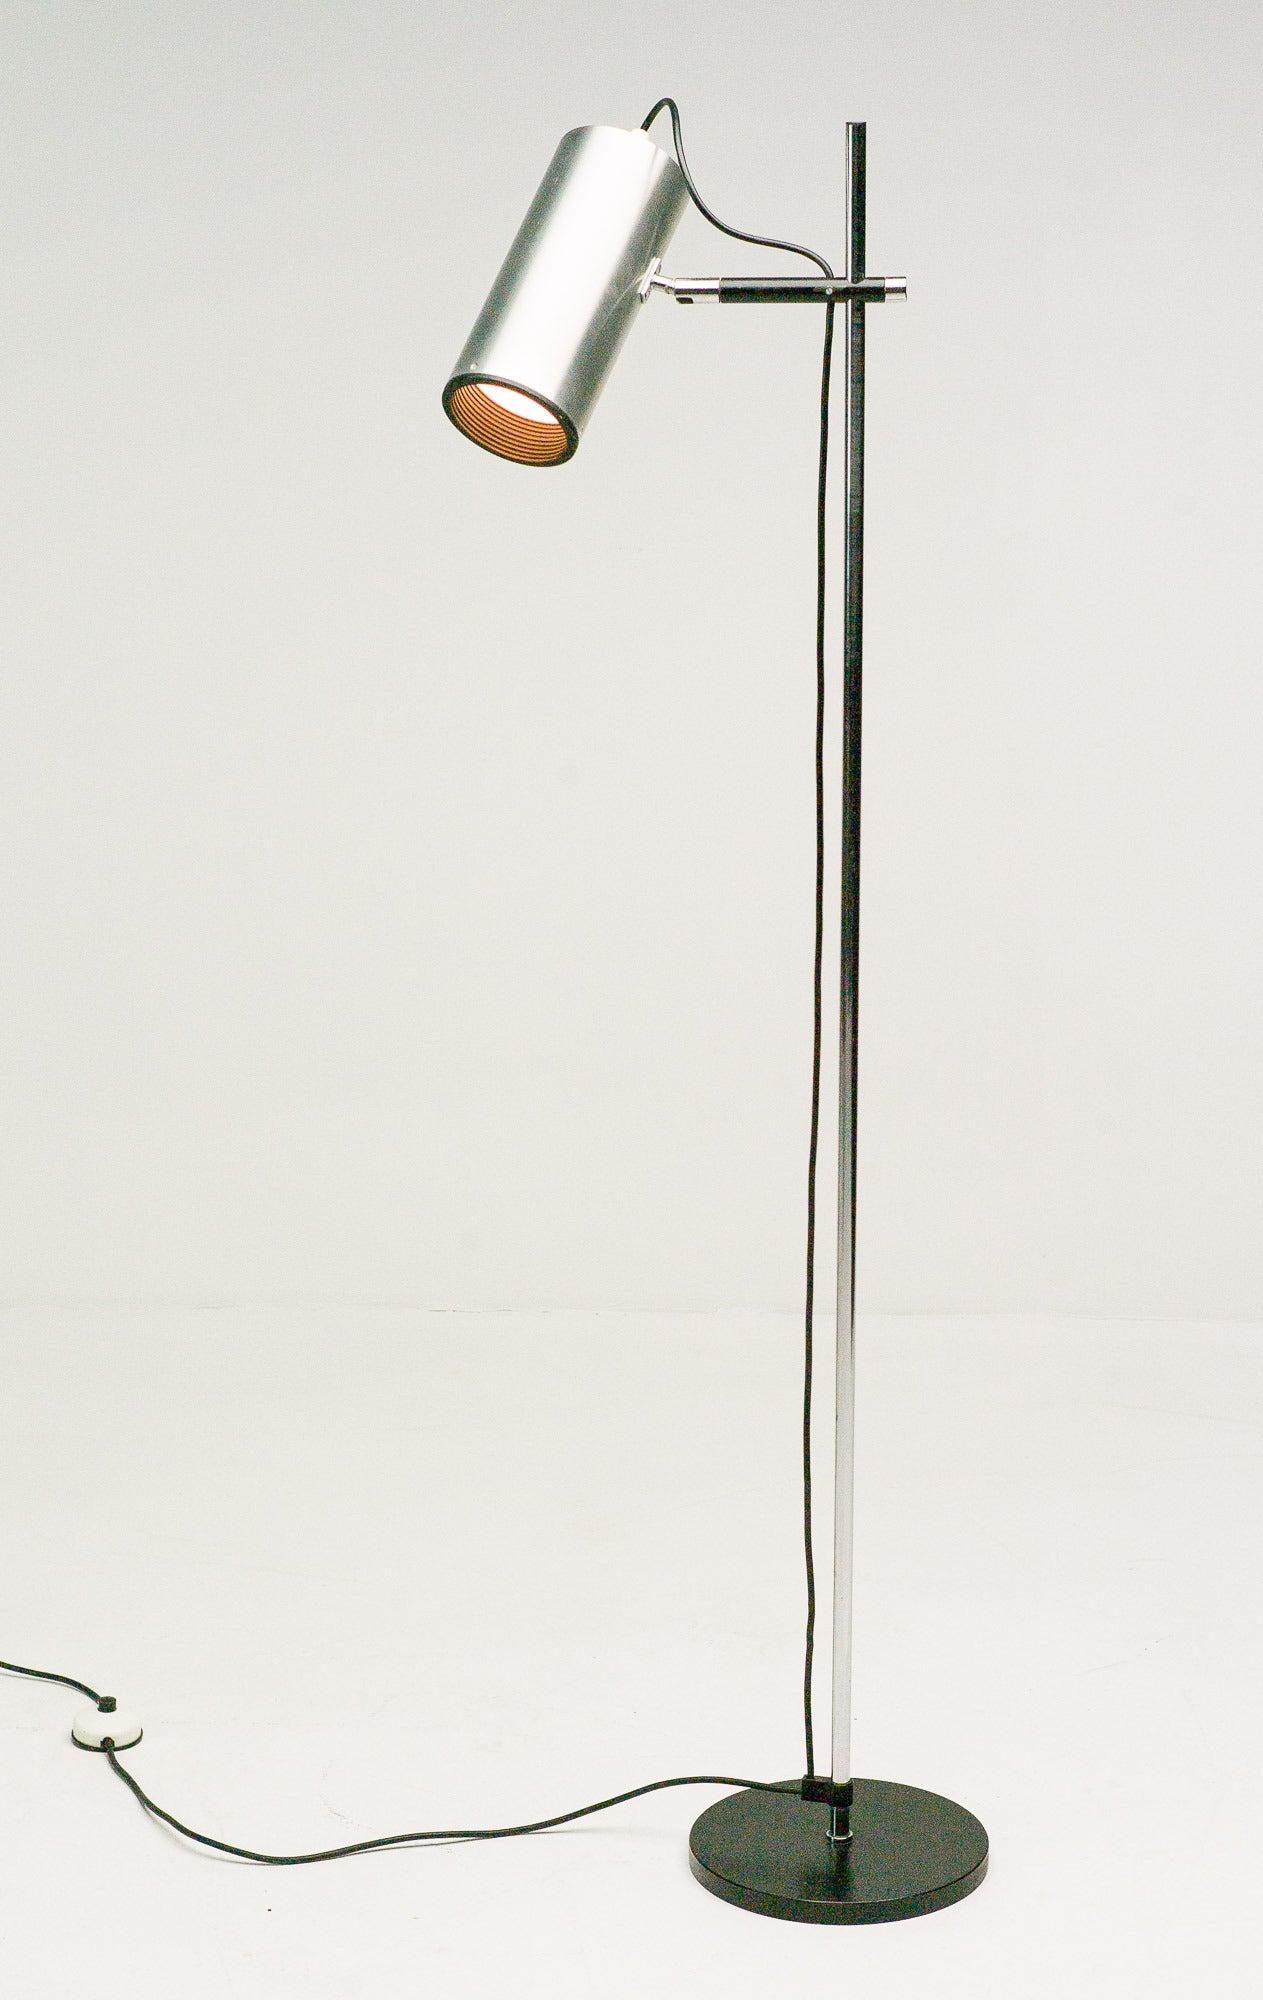 Maria Pergay Stainless Steel Floor Lamp At 1stdibs